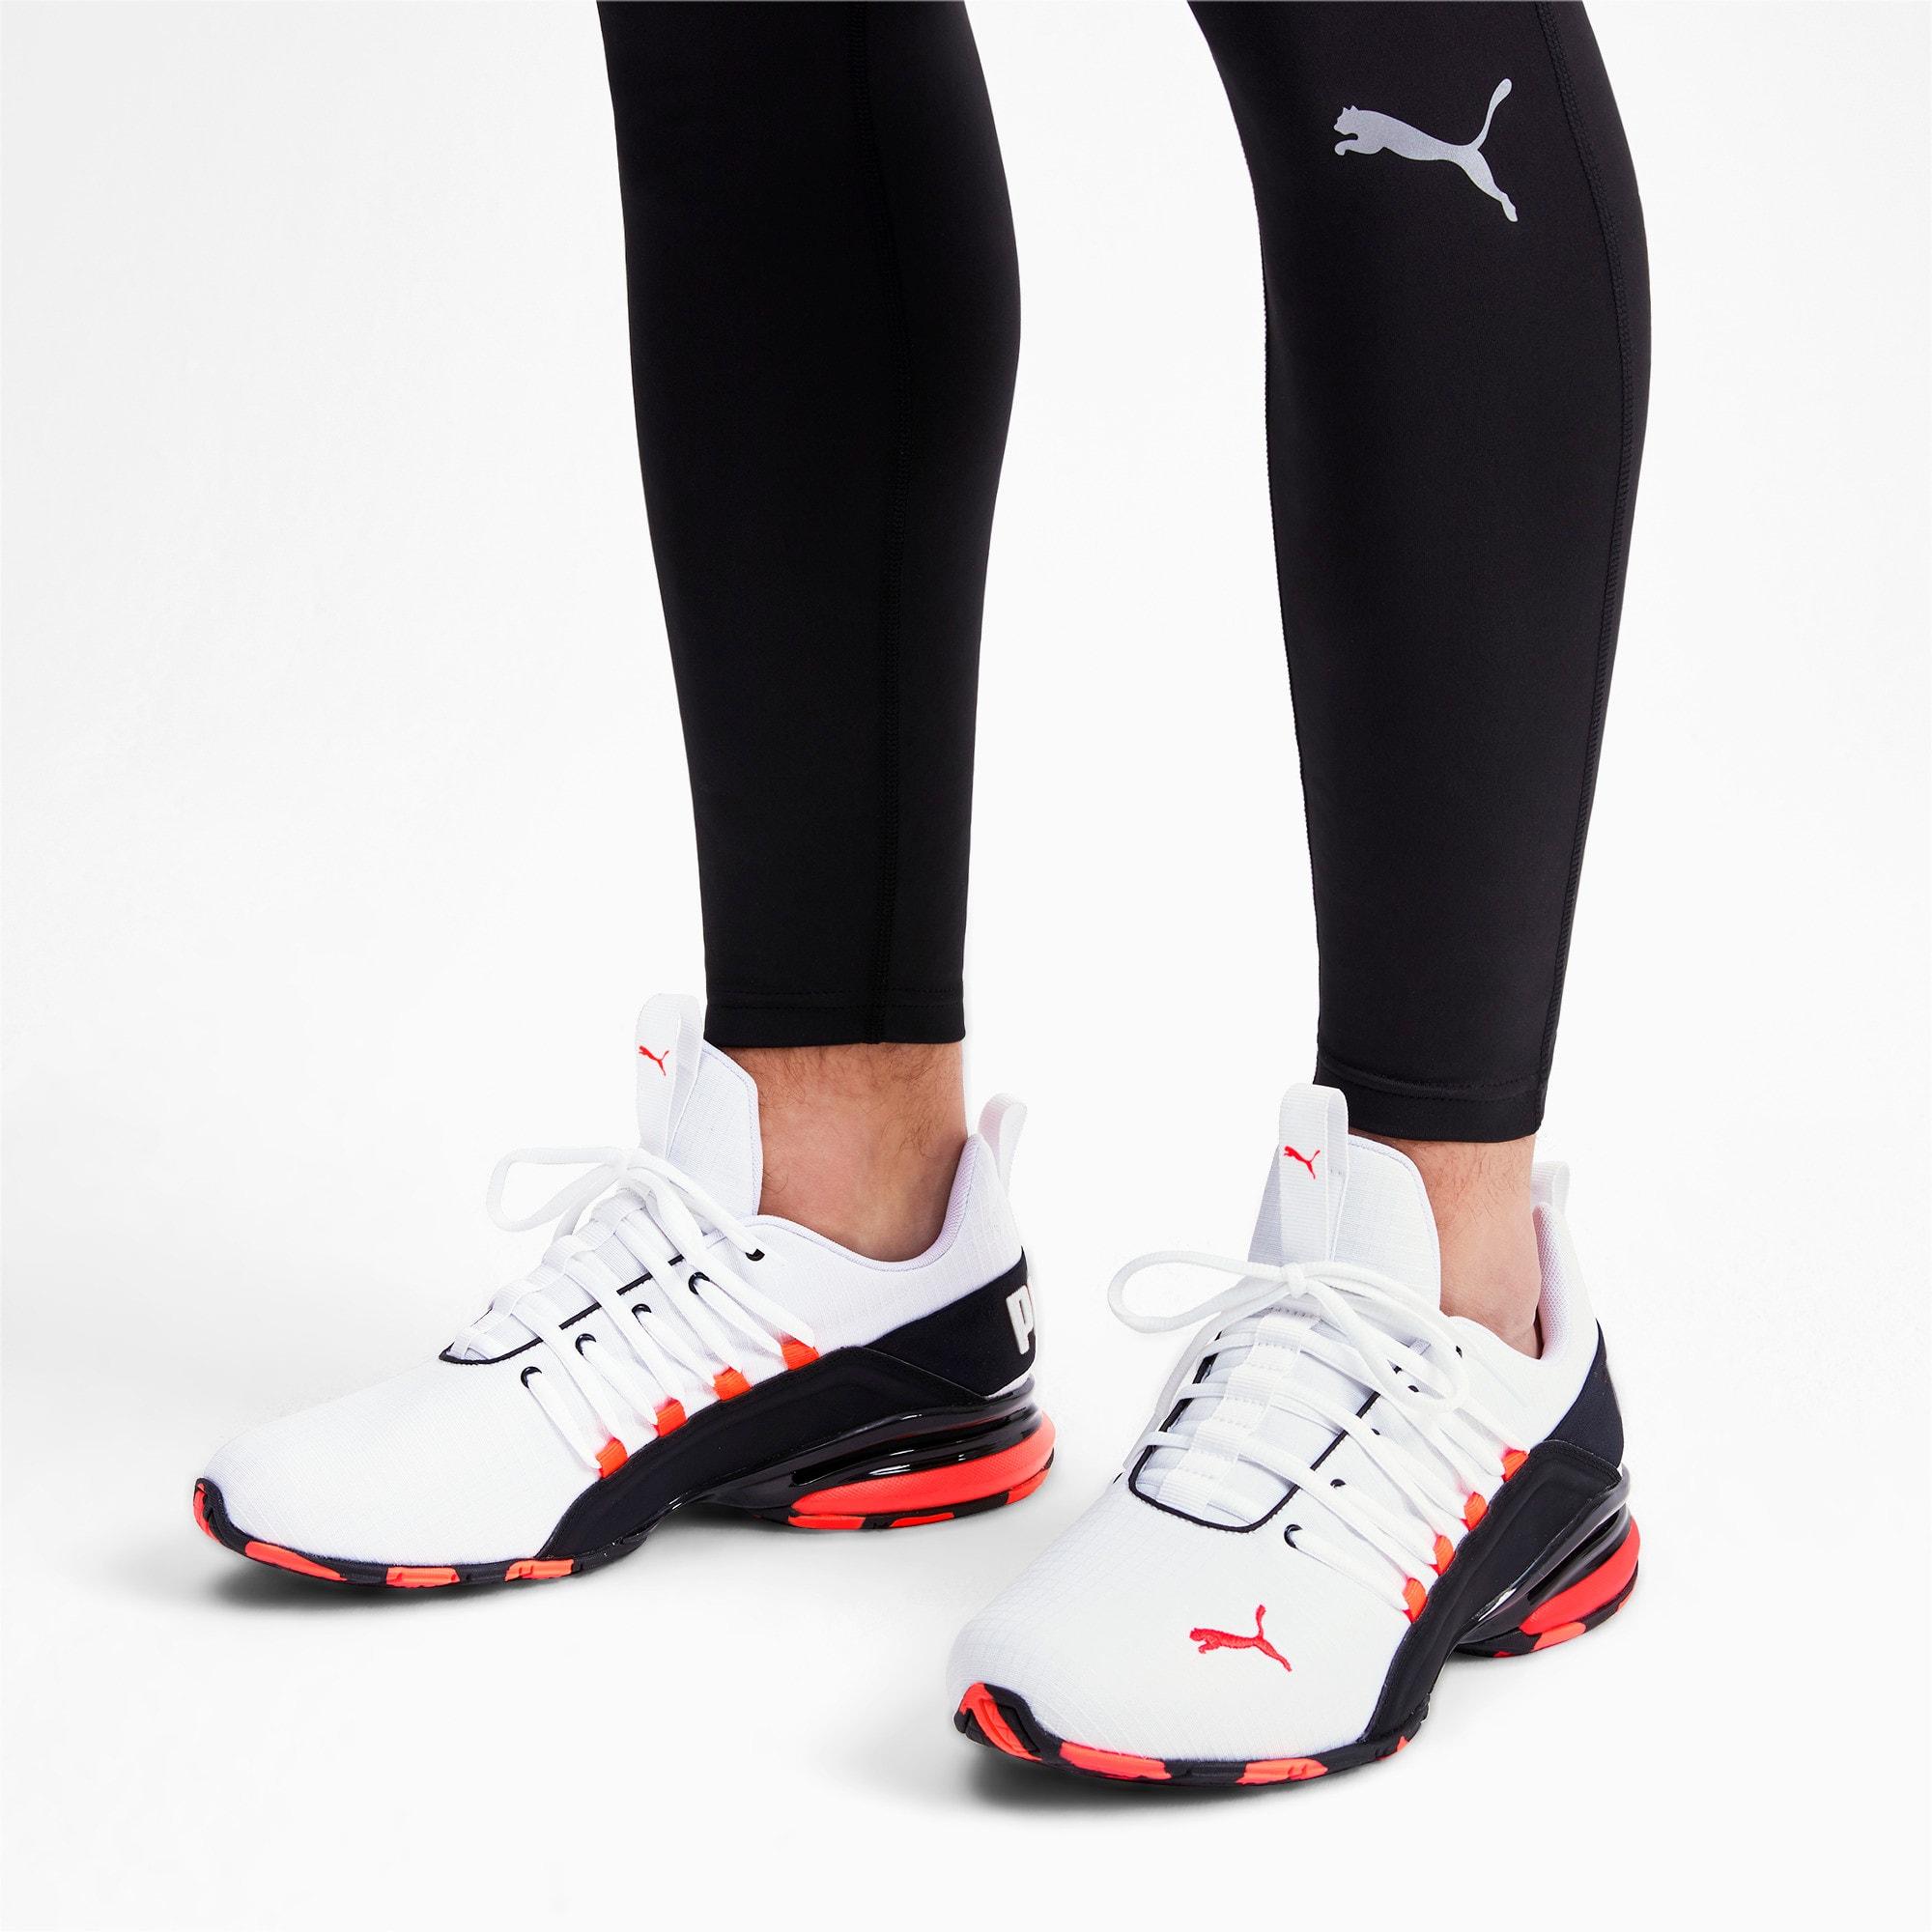 Thumbnail 3 of Axelion Rip Men's Training Shoes, White-Black-Nrgy Red, medium